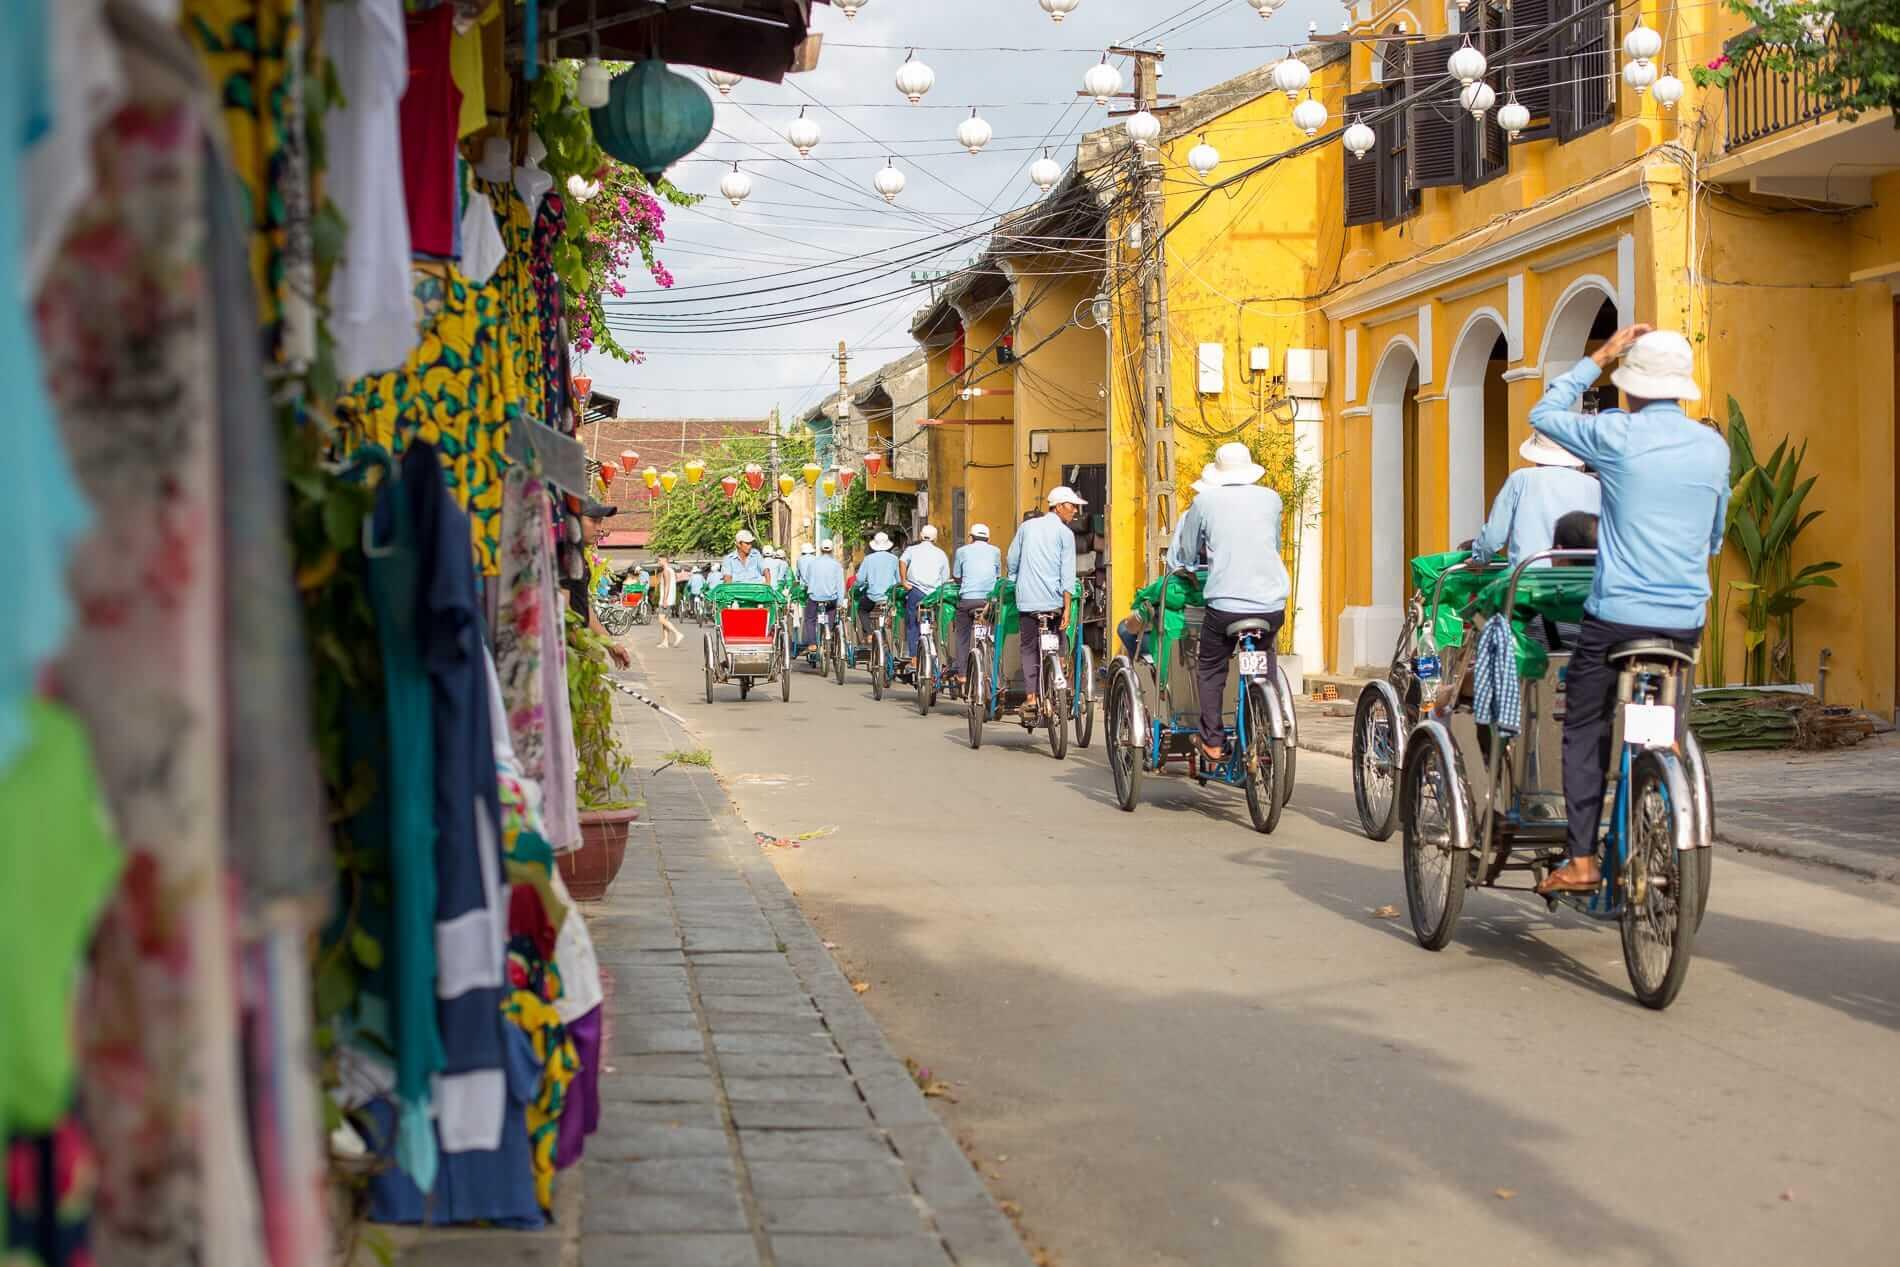 Cyclos cruise through Hoi An Old Town